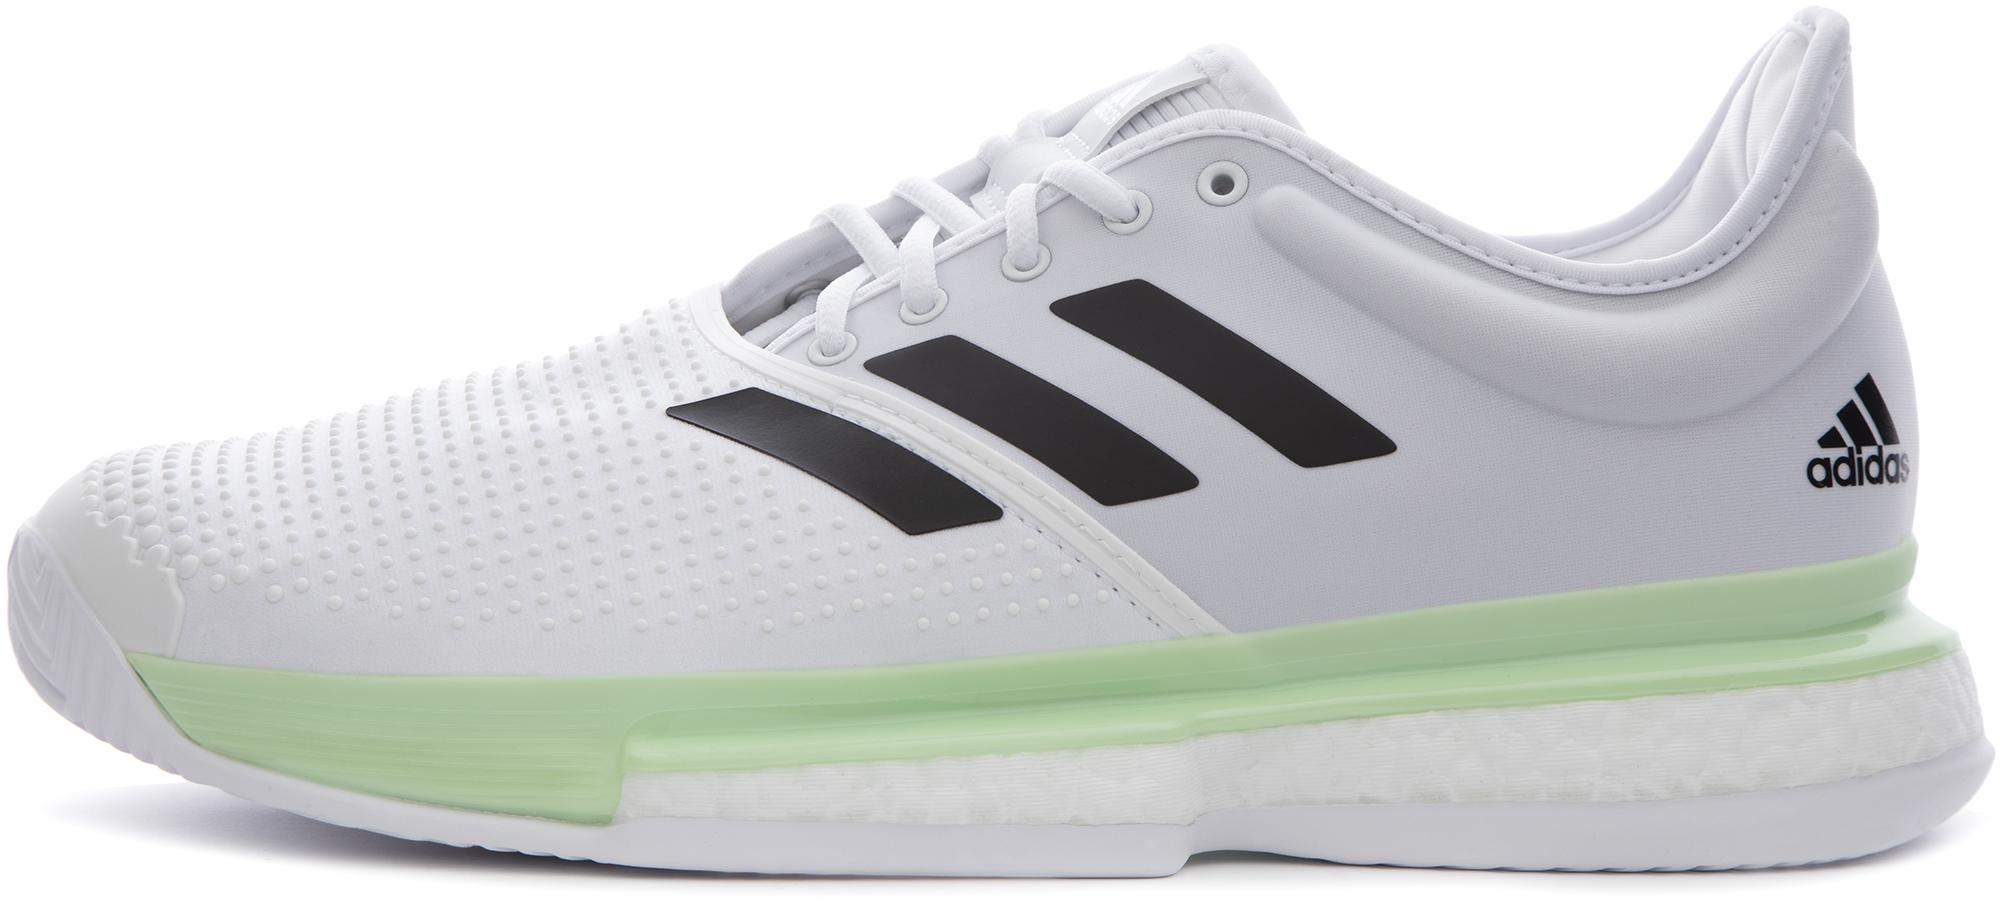 Adidas Кроссовки мужские adidas Boost, размер 40.5